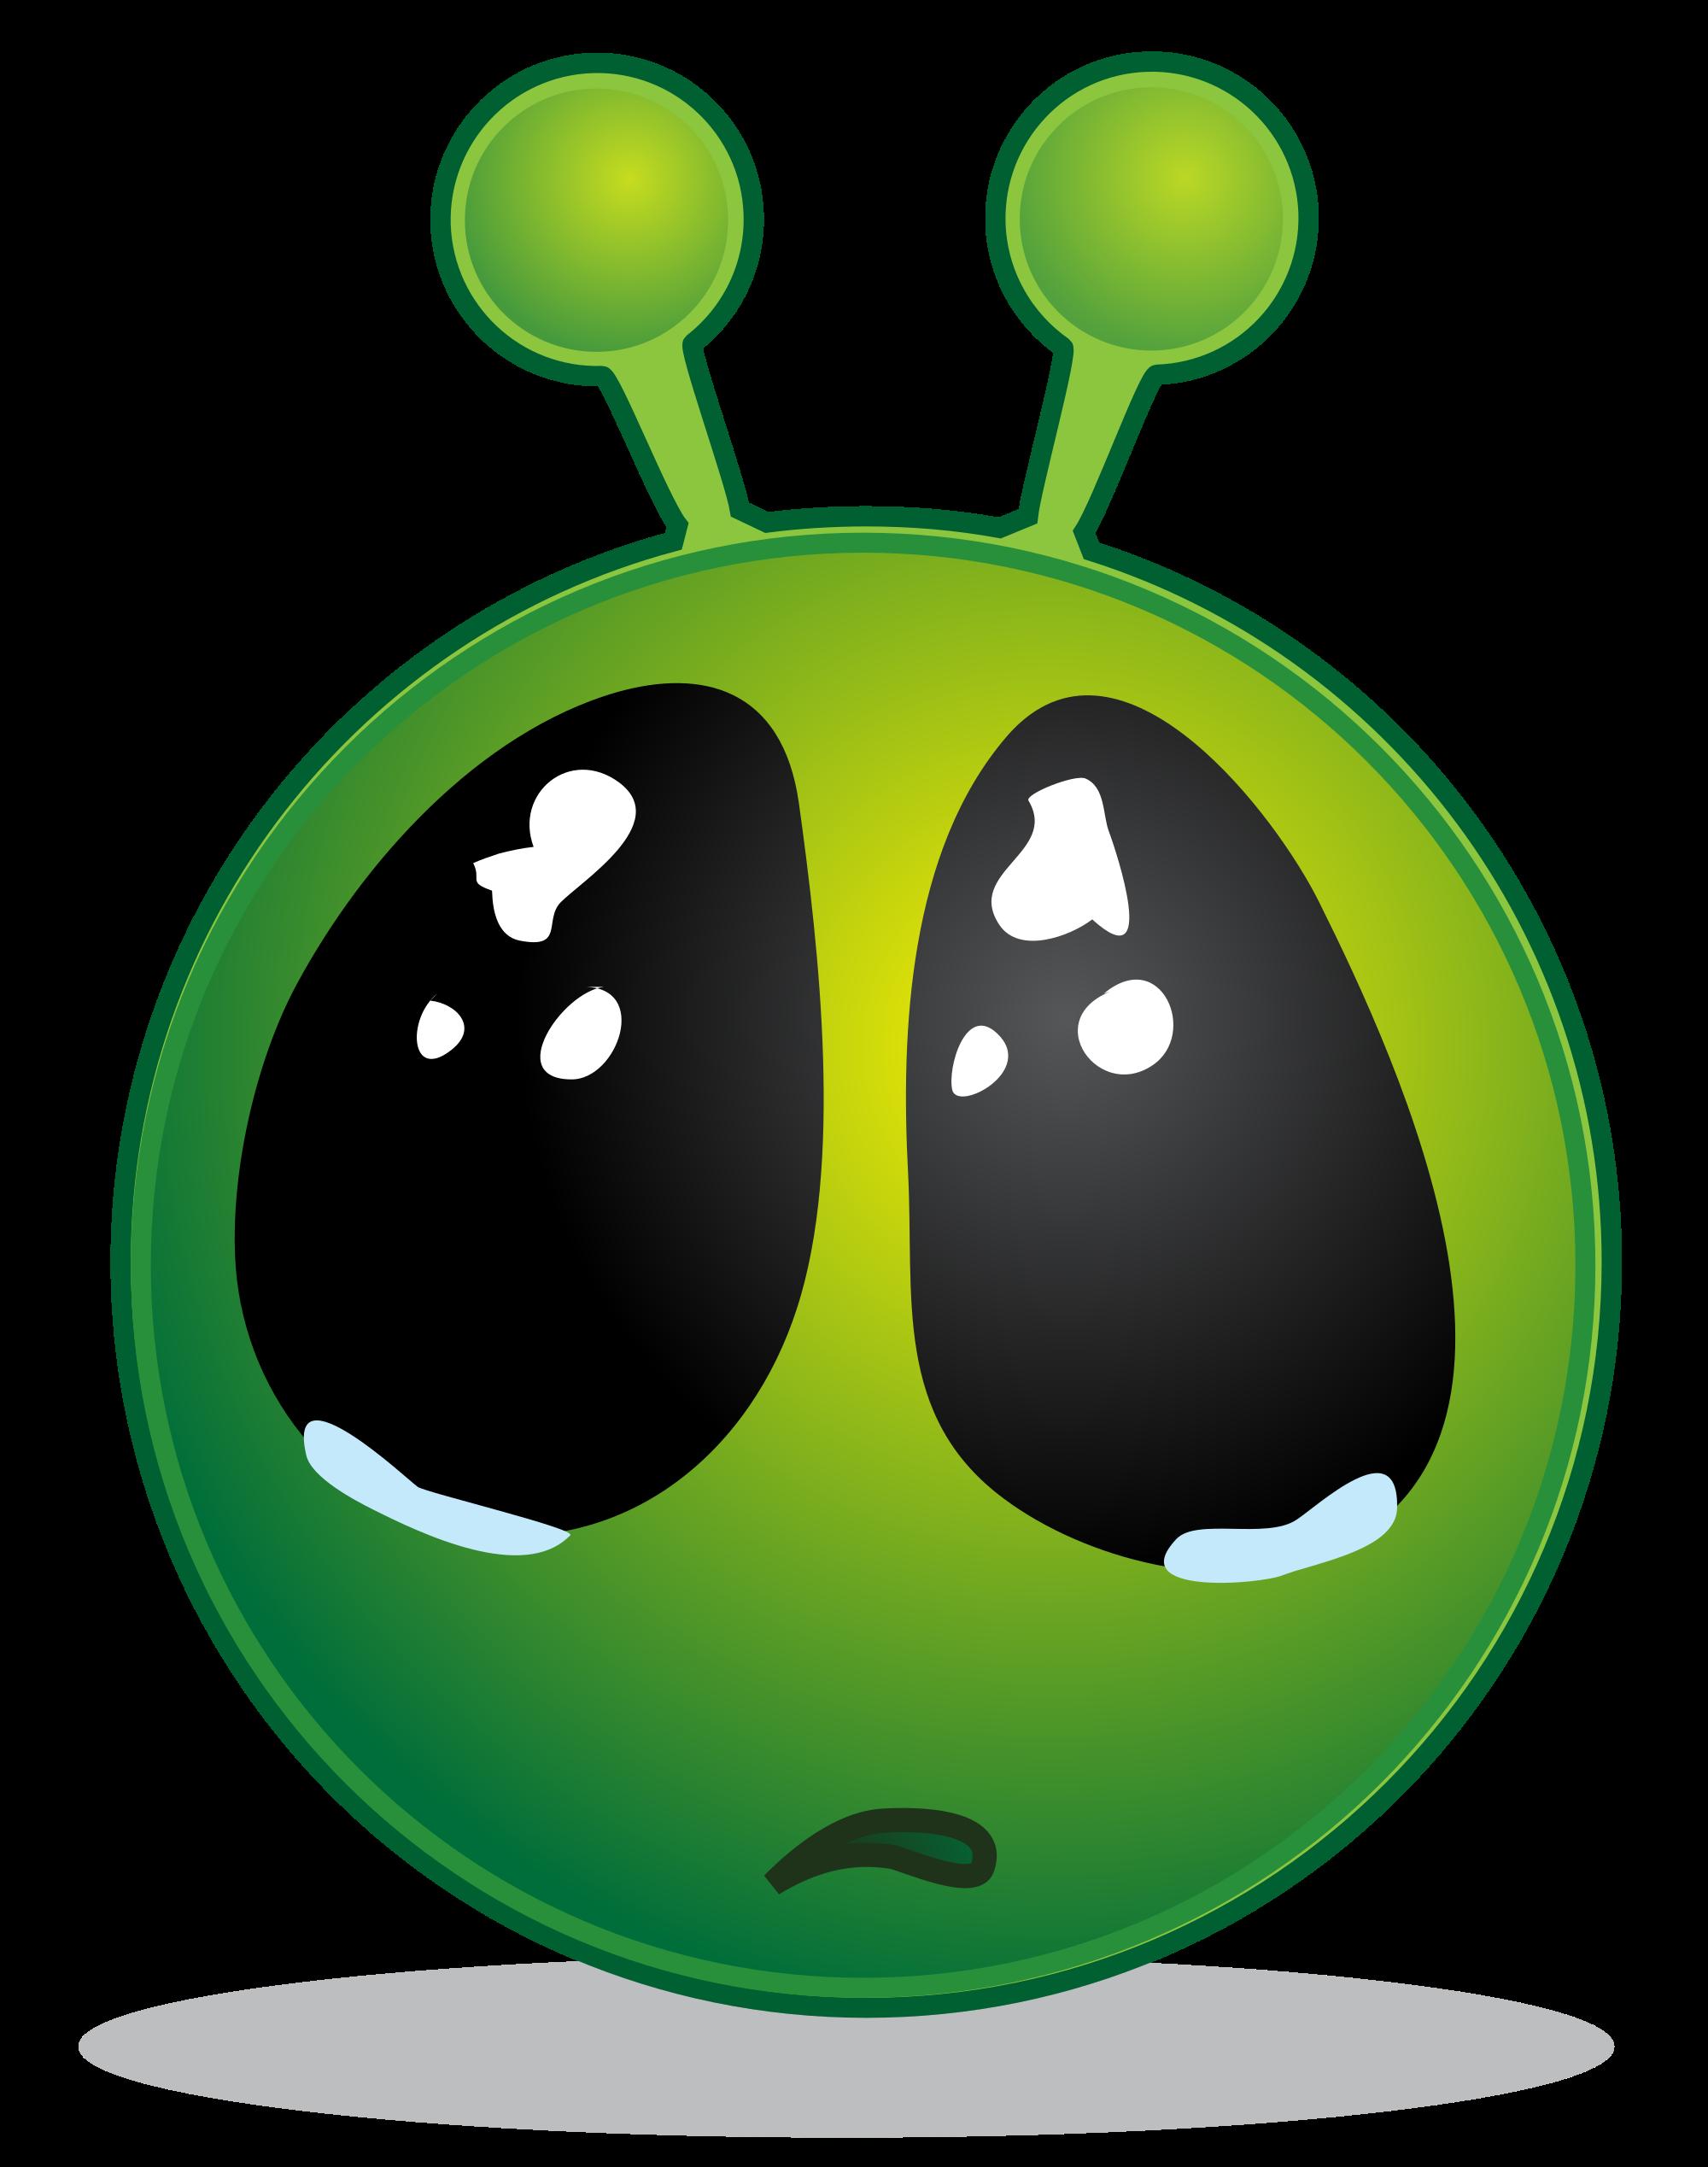 Green Eyes svg #14, Download drawings